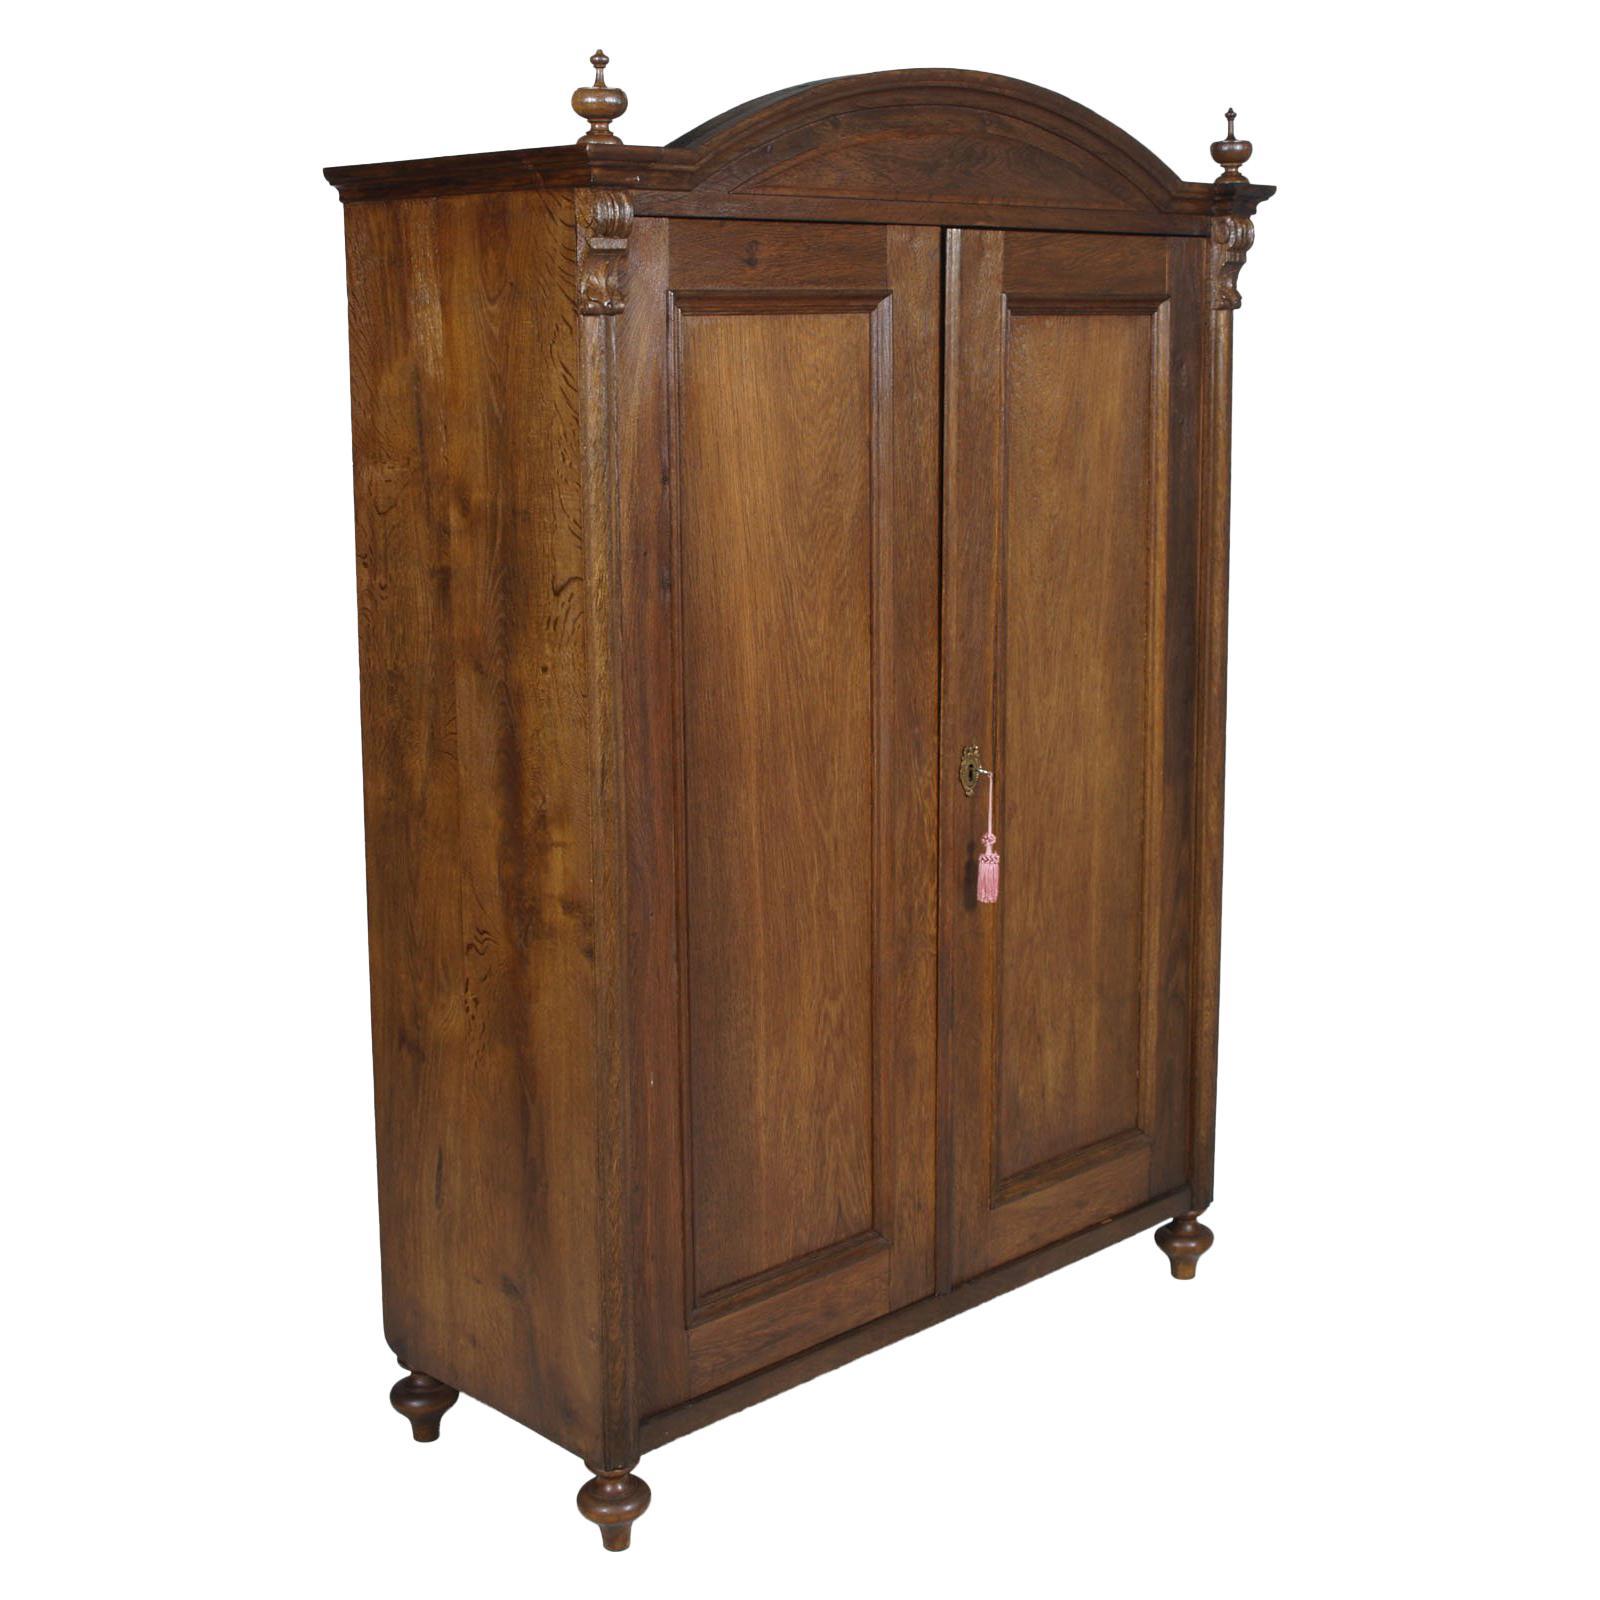 19th Century Austrian Neoclassic Wardrobe Closet in Massive Oak Wax Polished